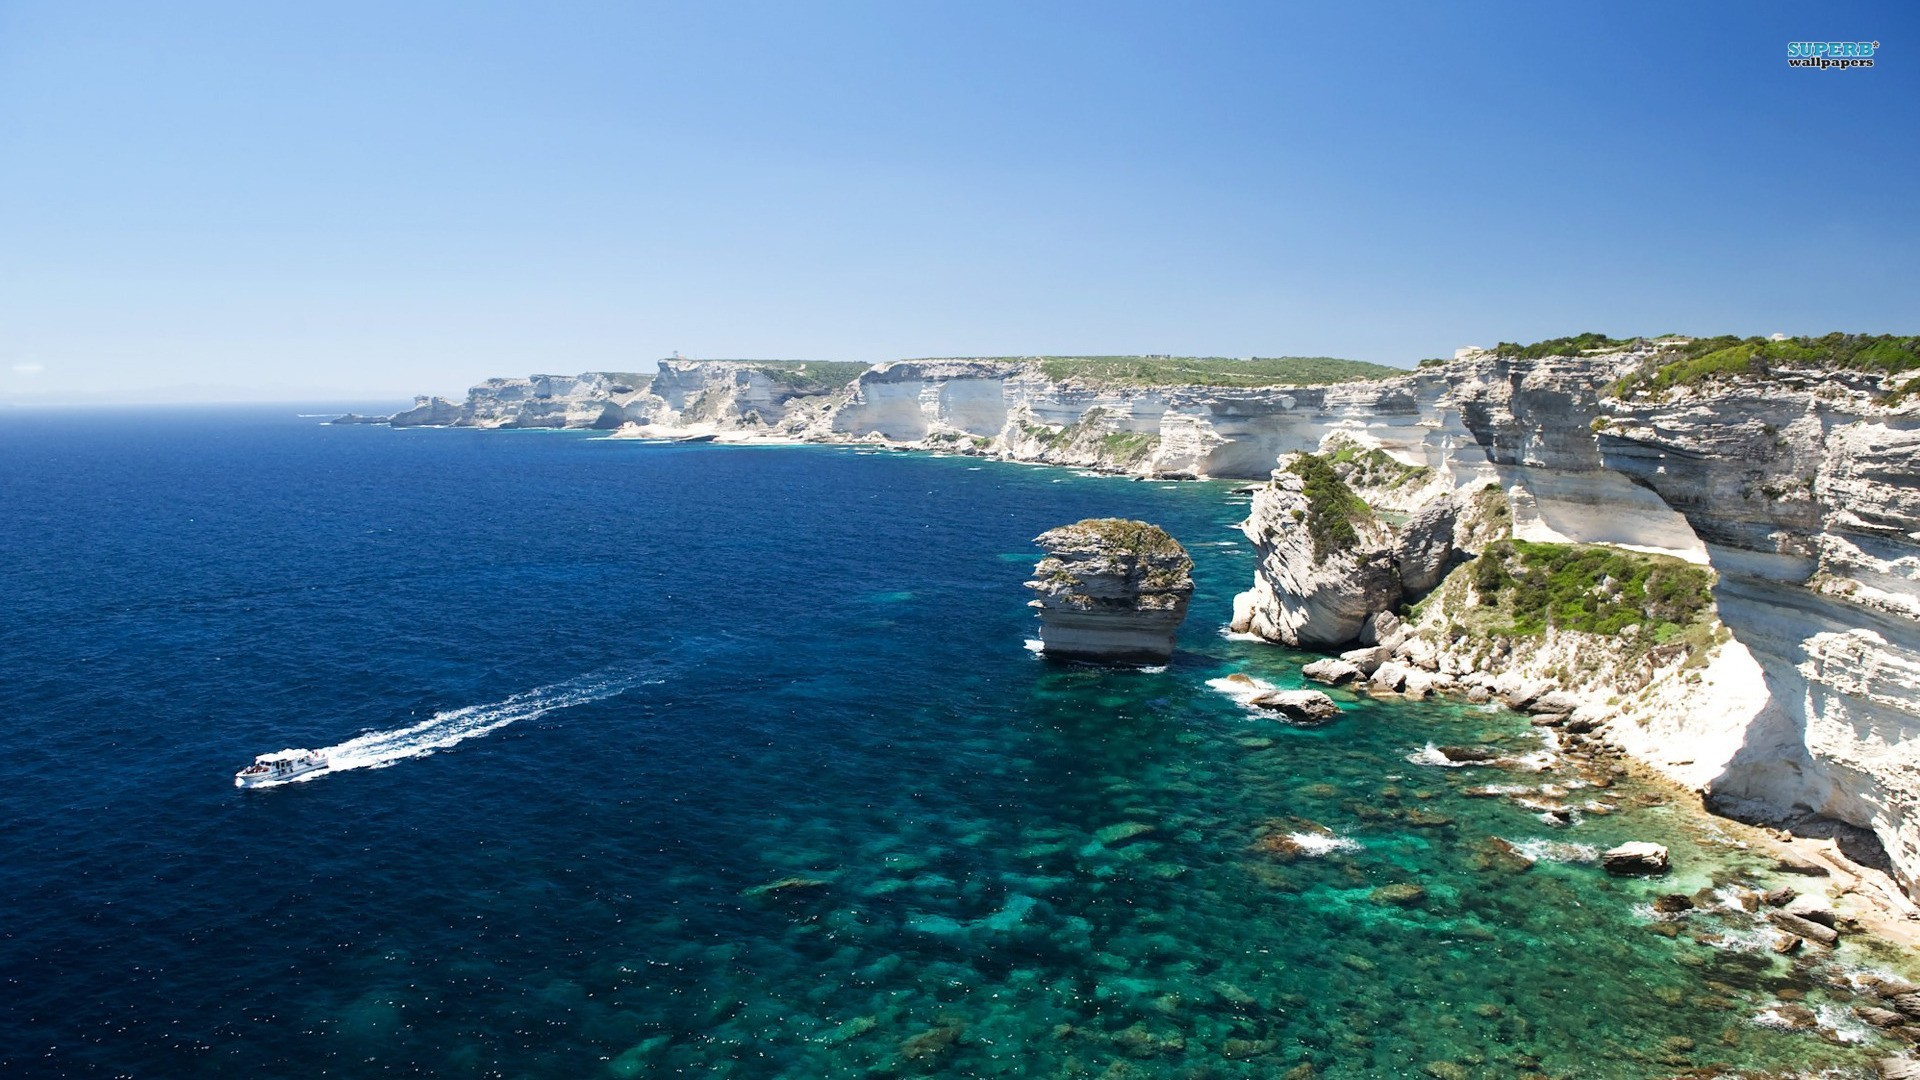 Sea Summerwater Apple Backgrounds Landscape CorsicaHD Beach 1920x1080